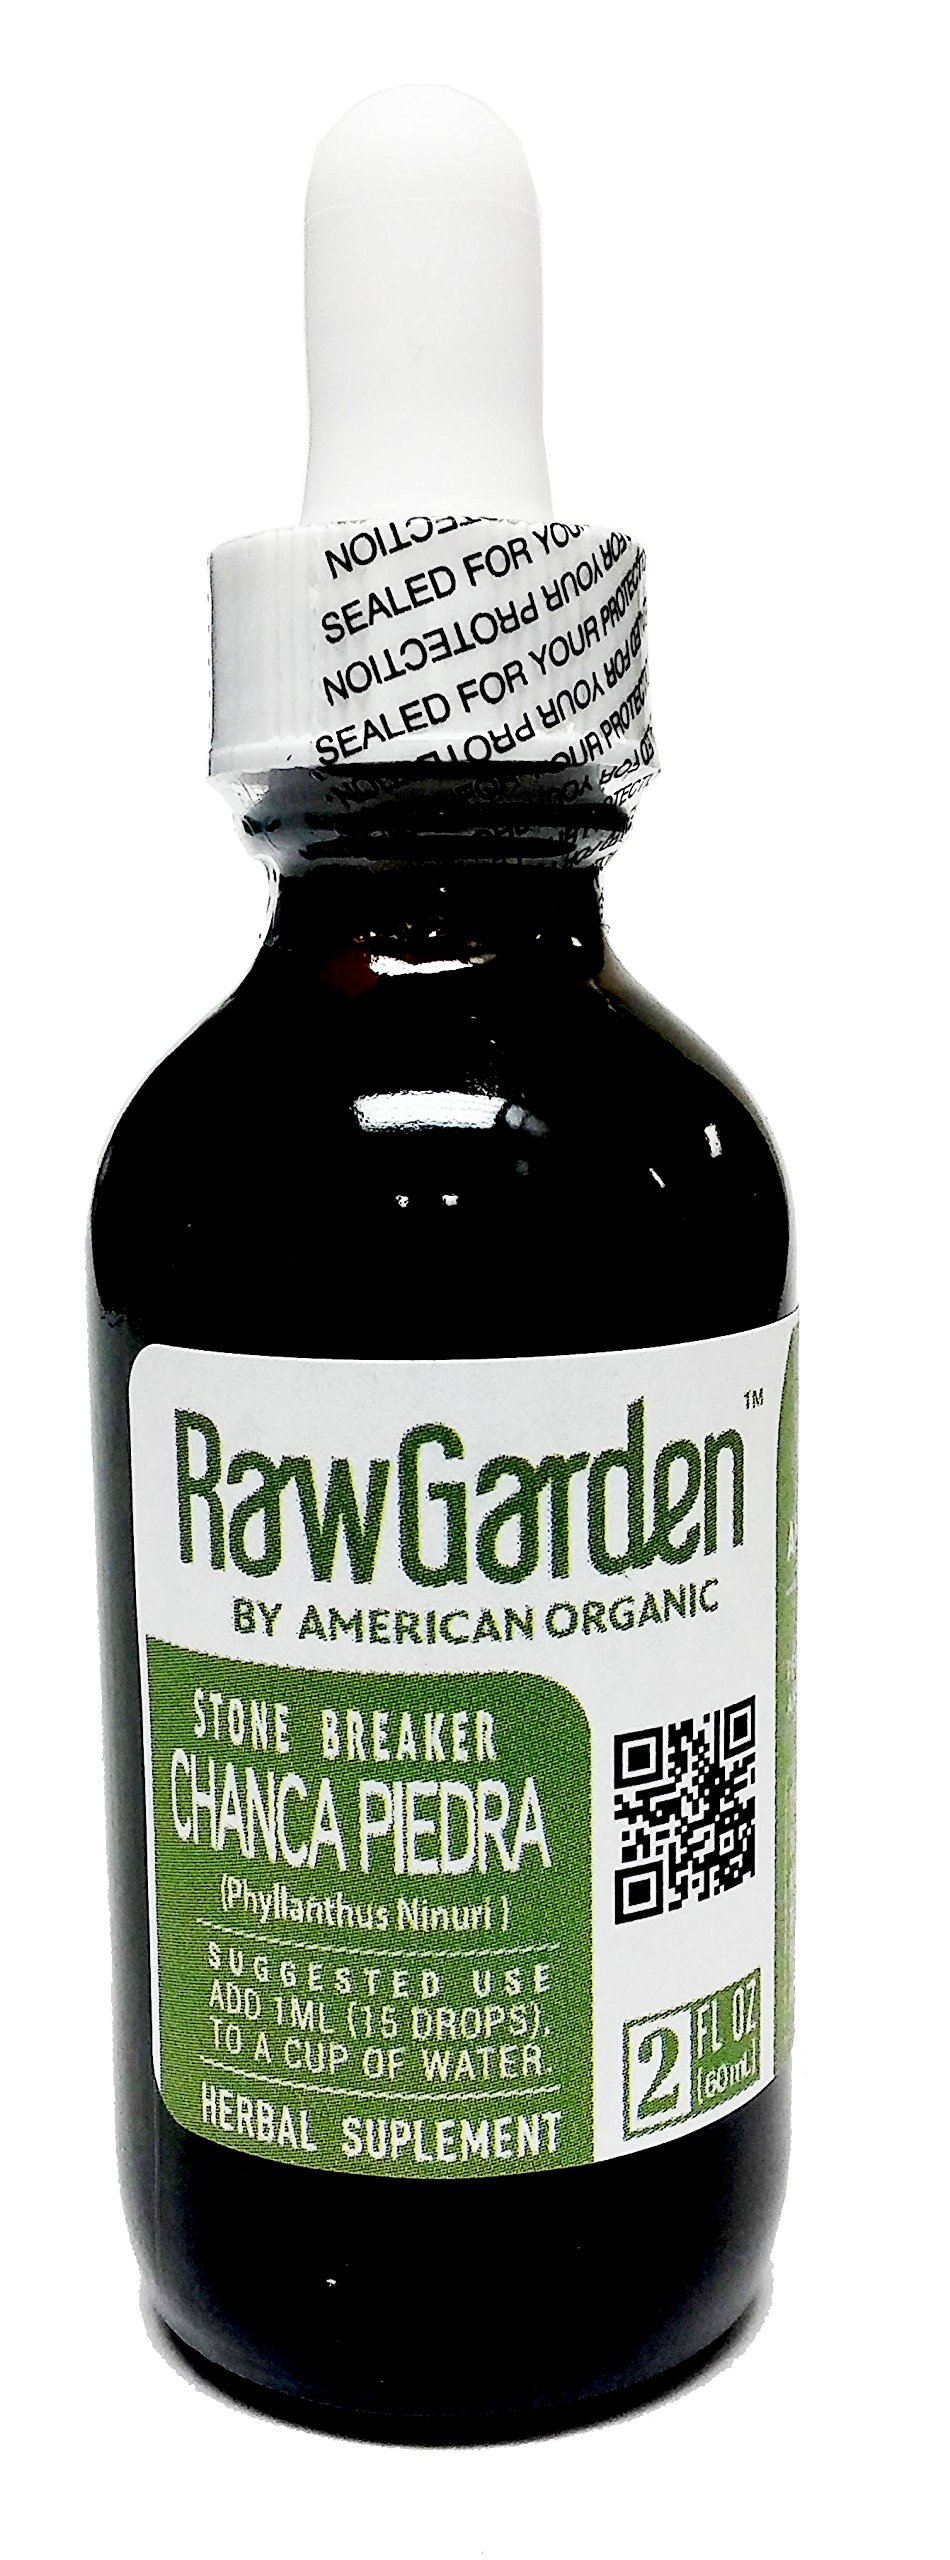 Raw Garden Chanca Piedra 2 oz Extract (stone Breaker) liquid Glass Amber Bottle. by Raw Garden